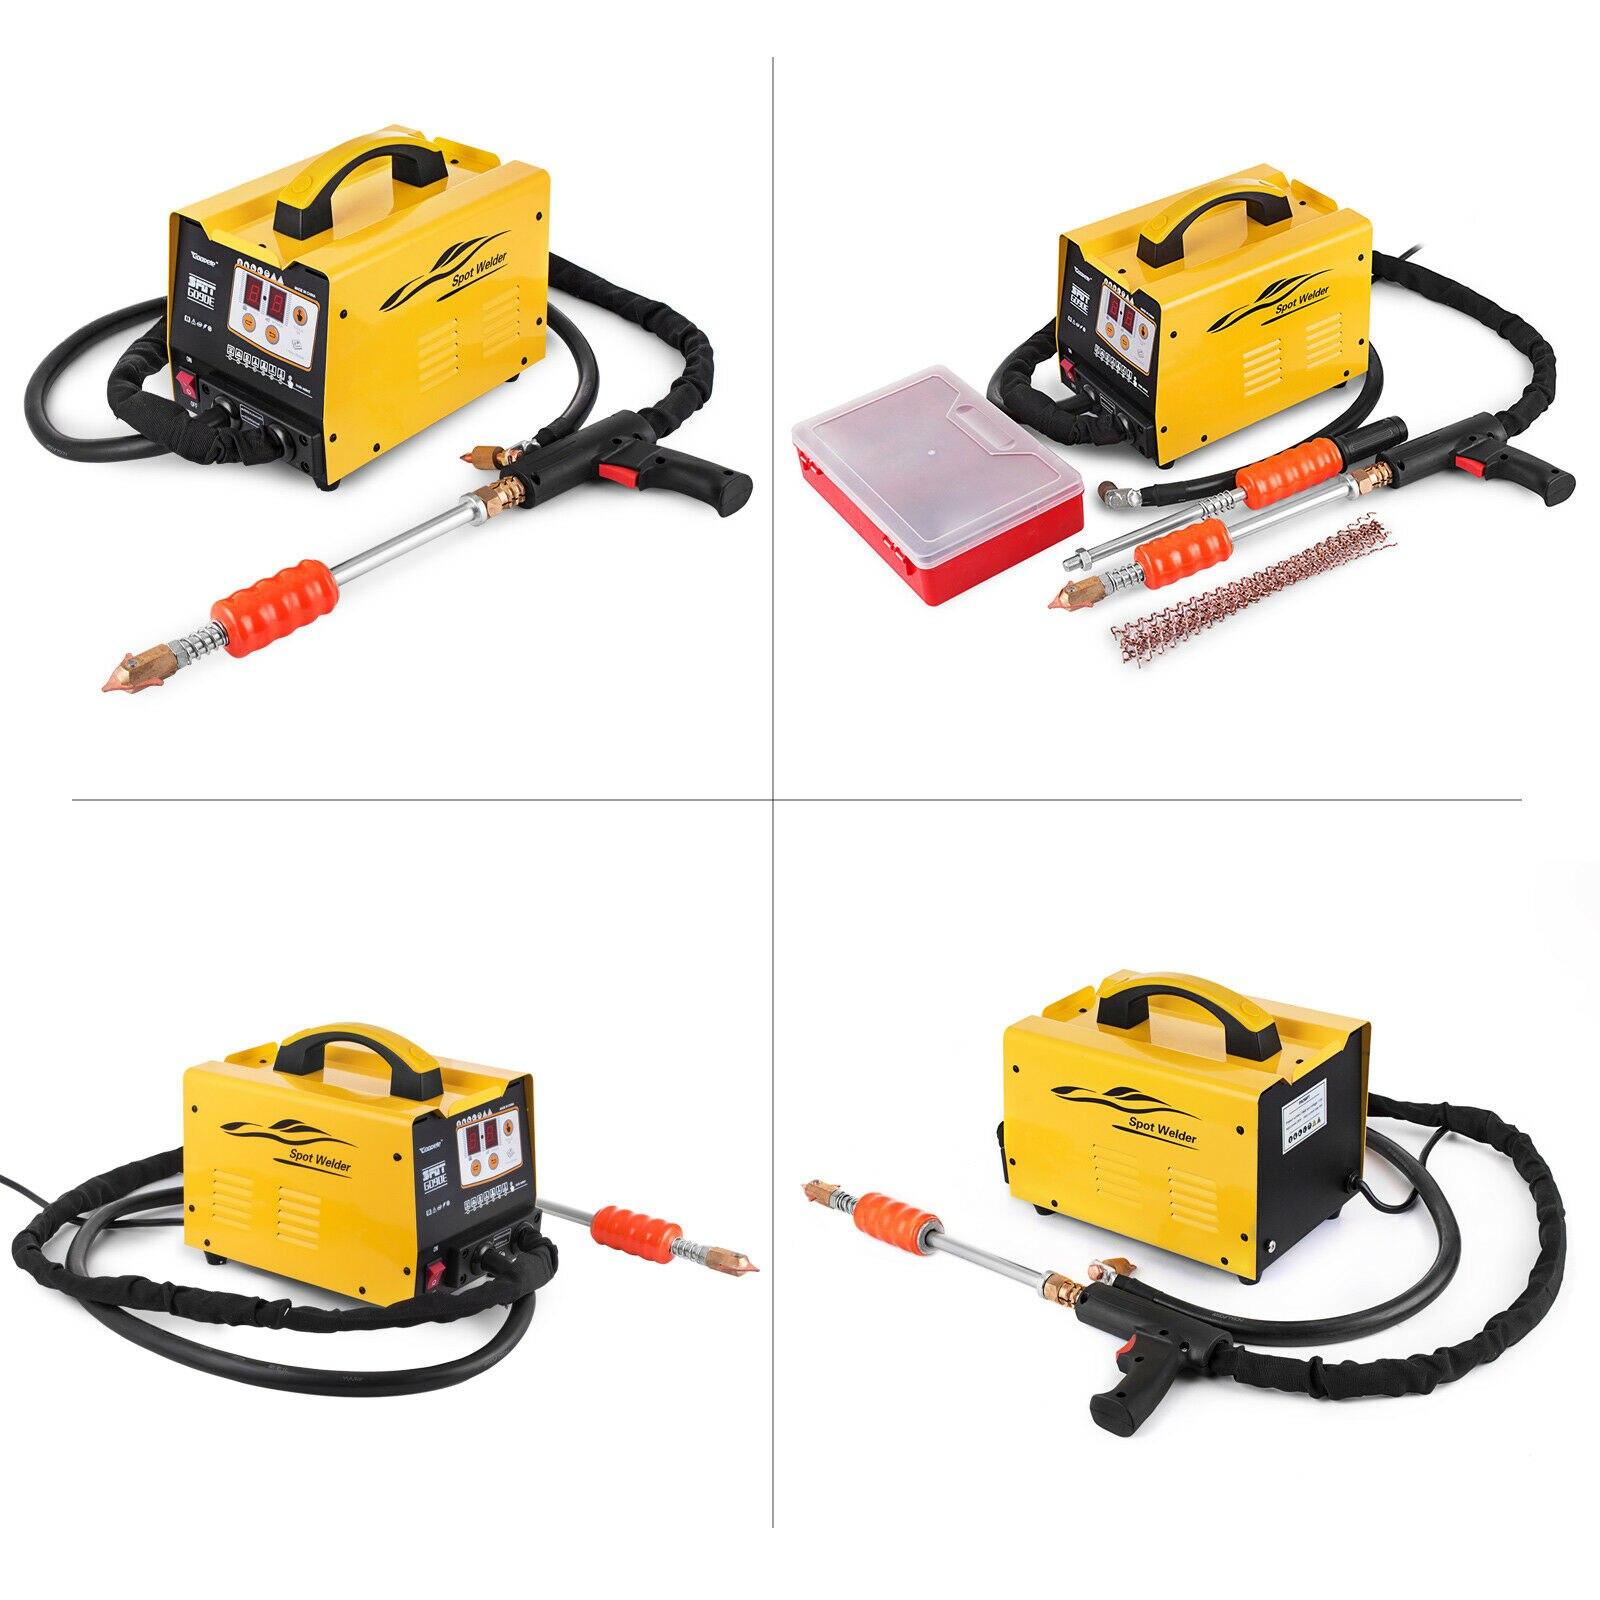 home improvement : HUNDURE 46mm Cylinder Piston Oil Seal Spark Plug Kit For Husqvarna 51 55 Rancher Chainsaw Parts   503609171  503 60 91-71